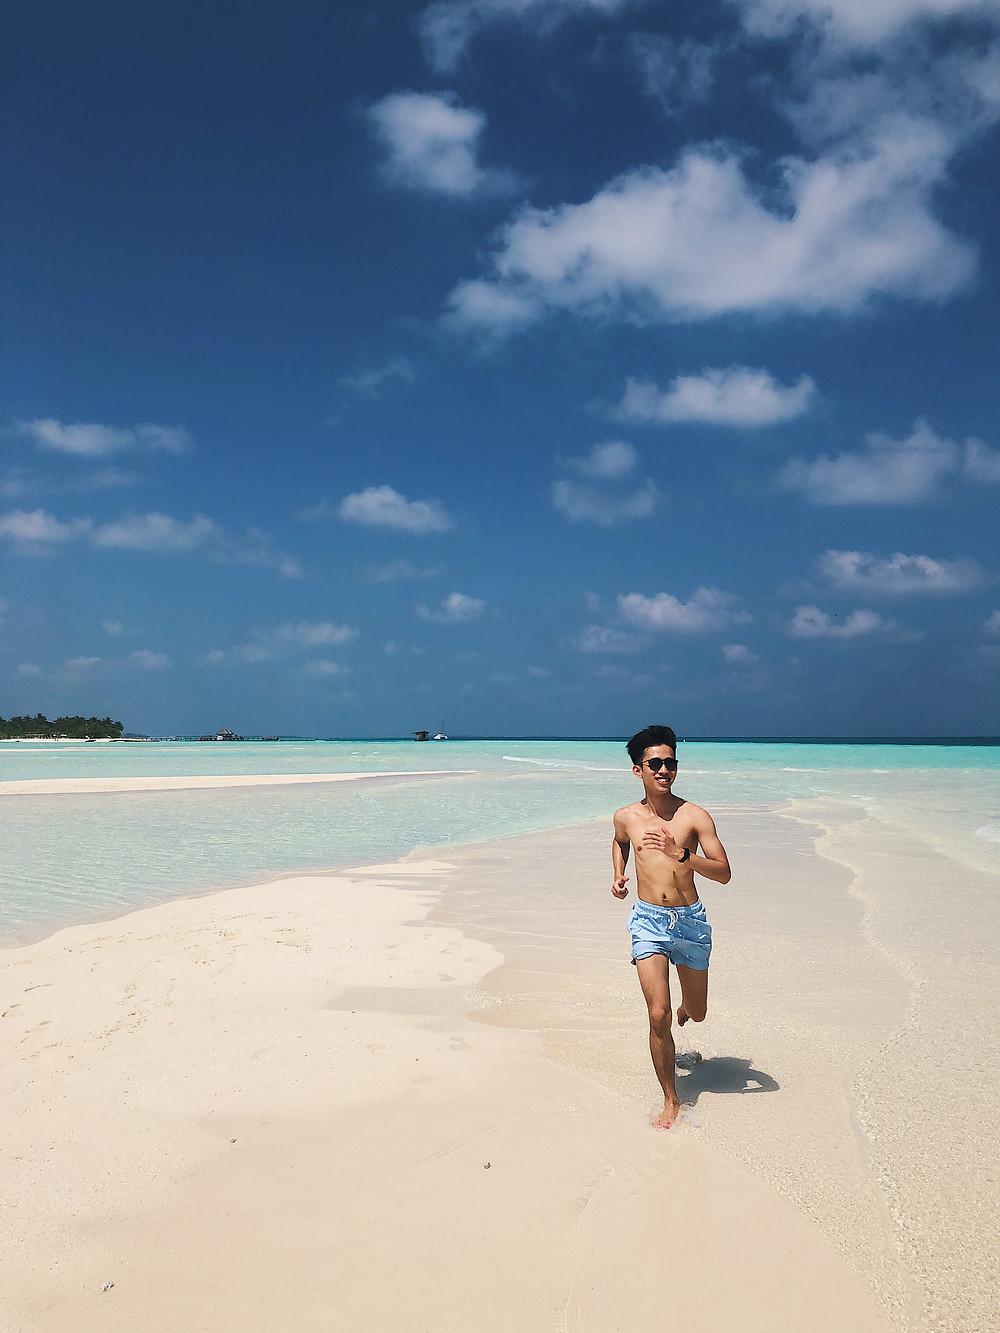 Beaches in the Maldives